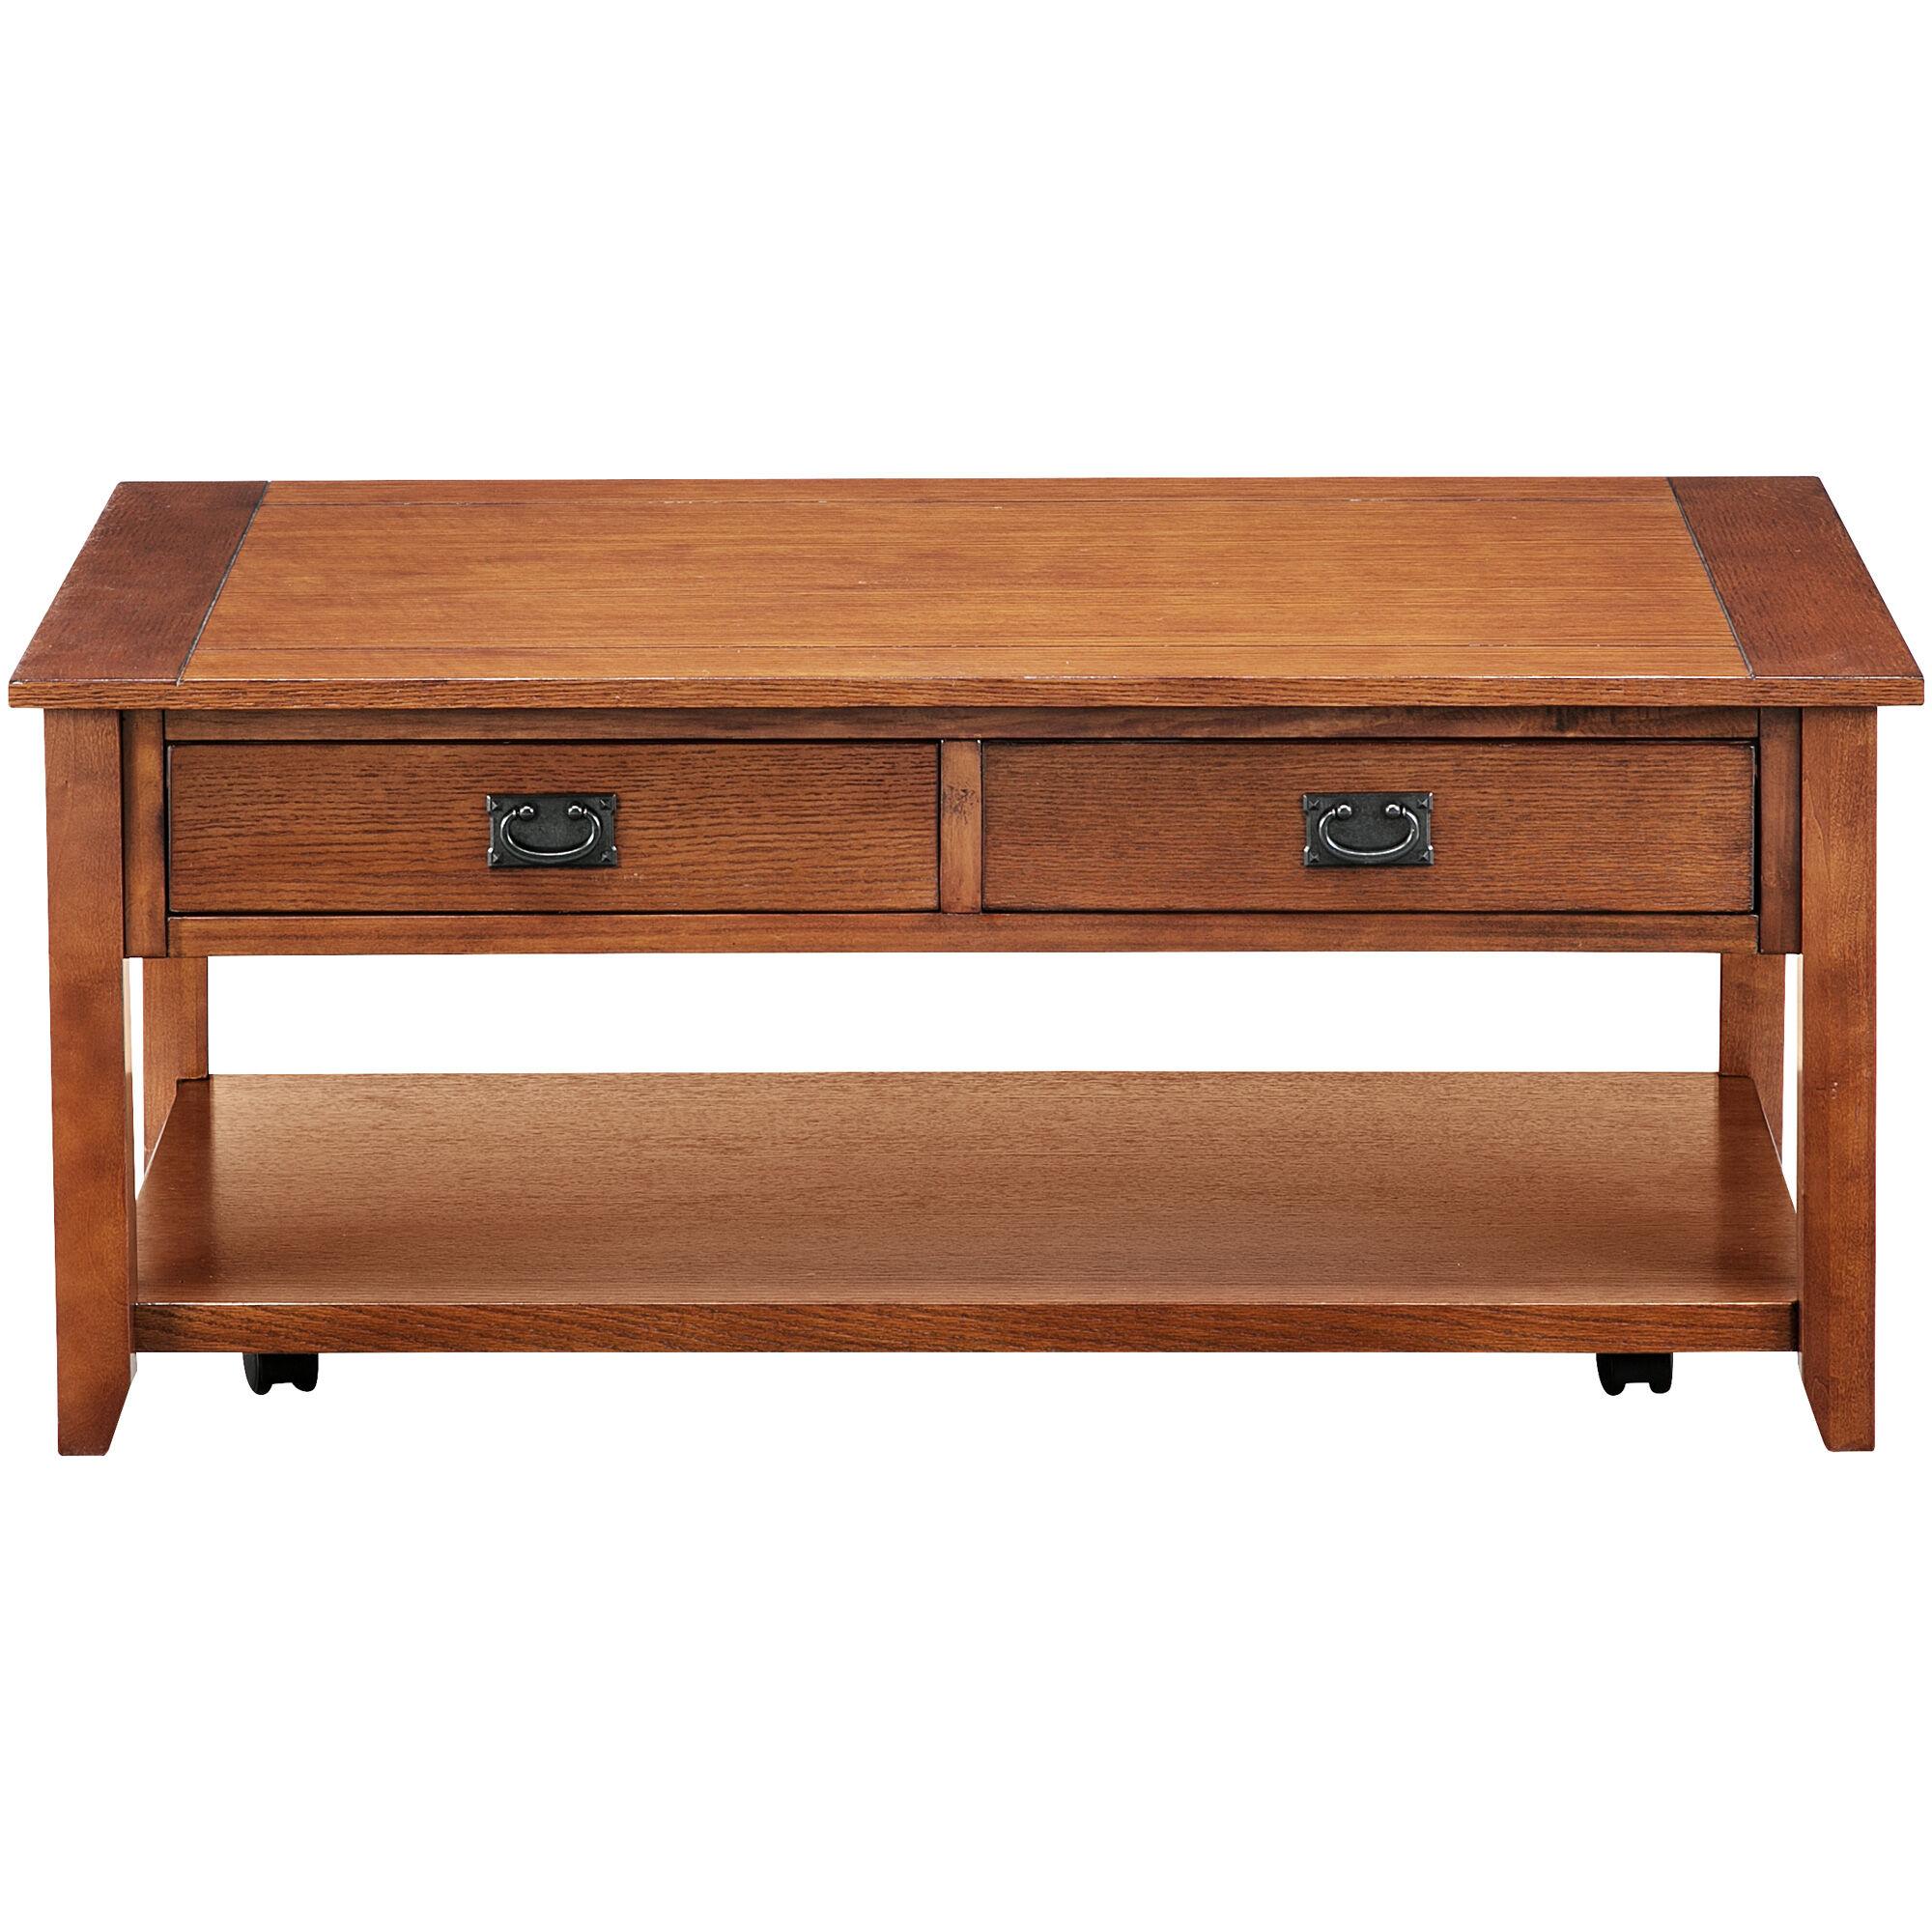 Rutledge Oak Coffee Table; Rutledge Oak Coffee Table ...